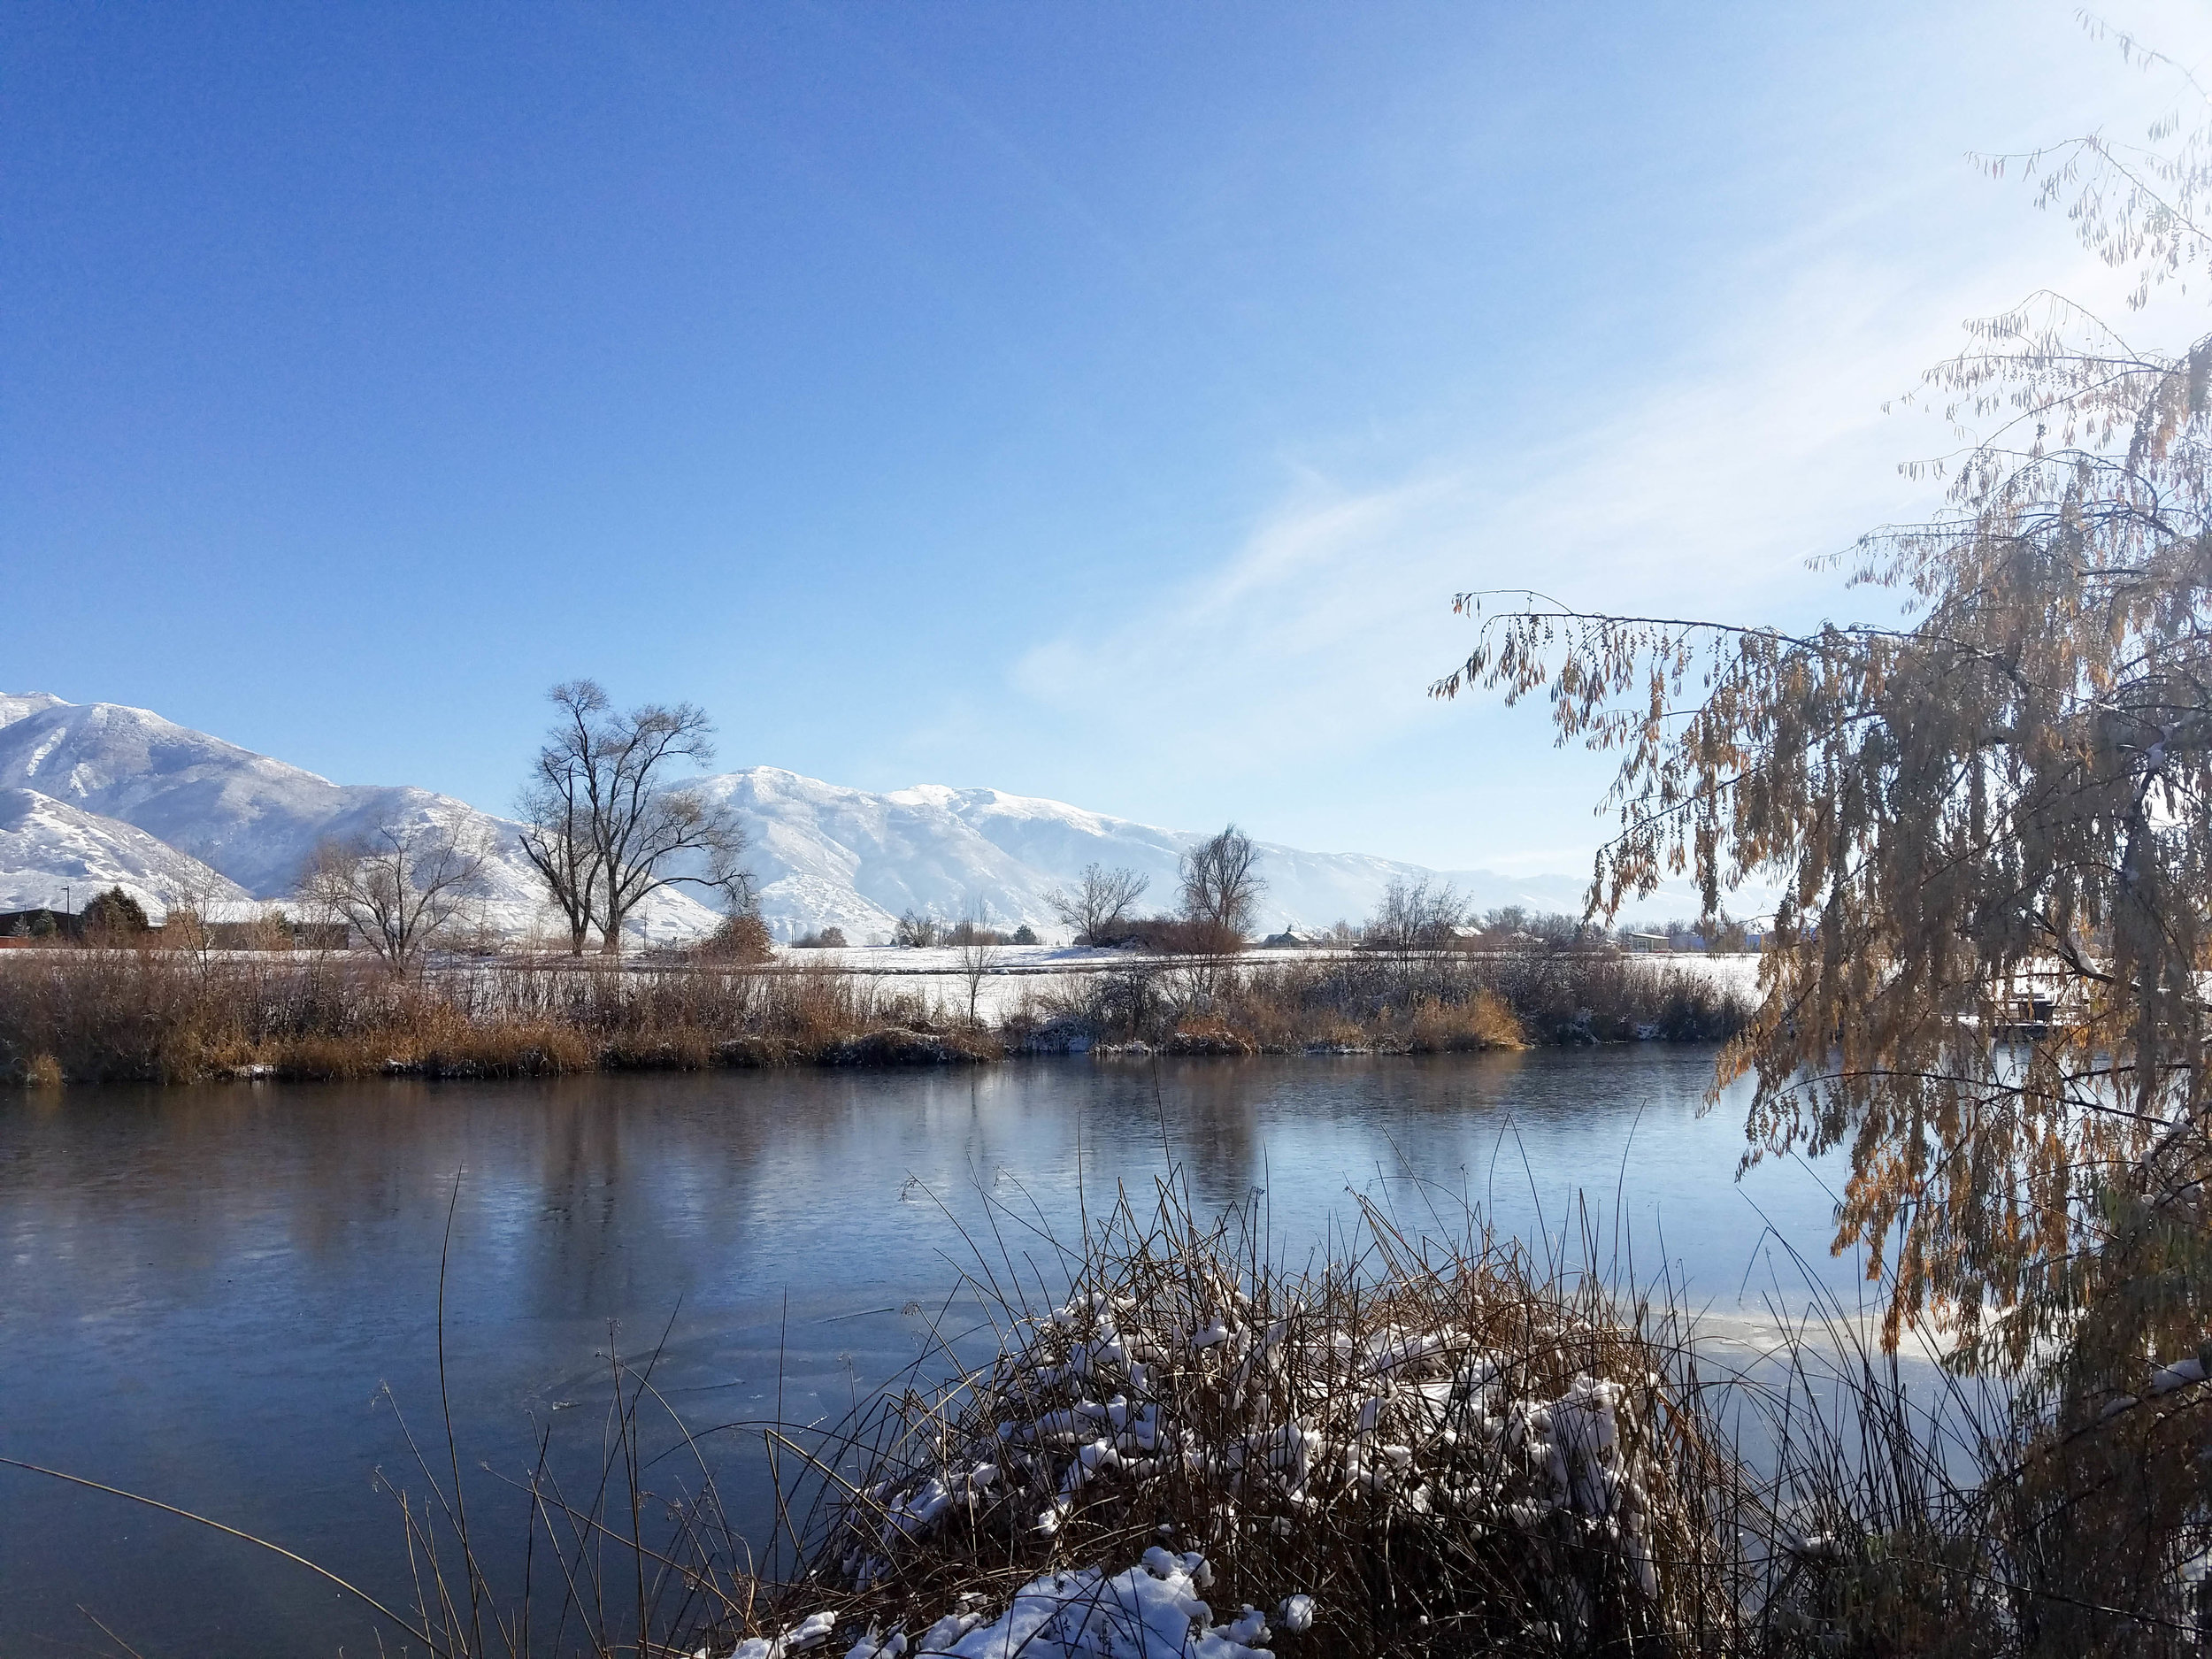 winter date ideas davis county, utah